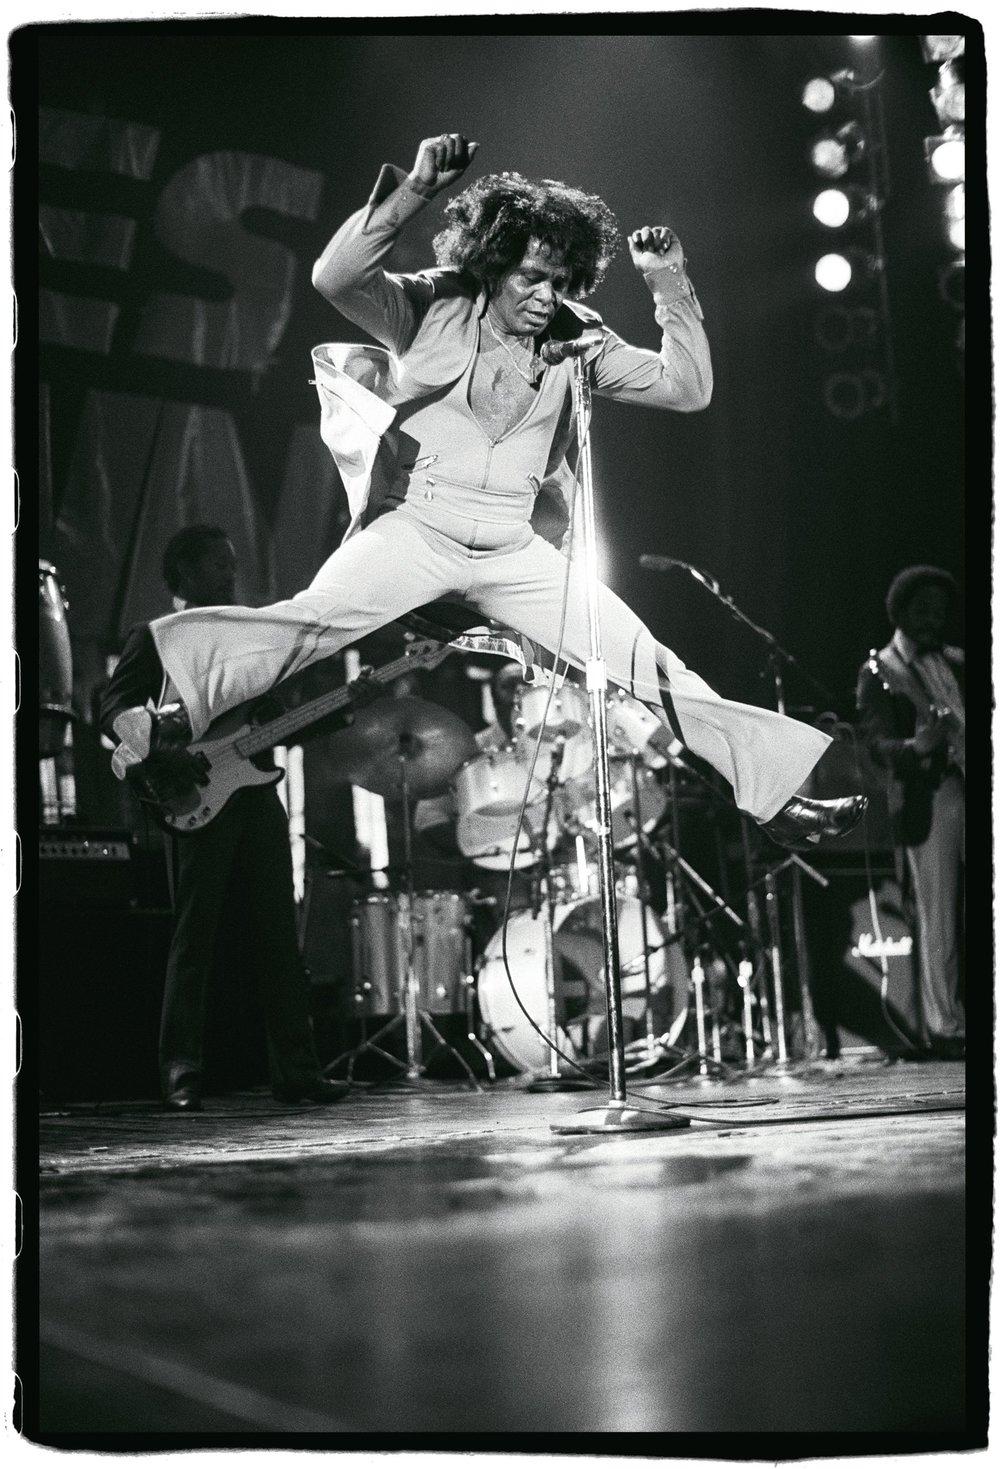 James Brown, Hammersmith Odeon, London, UK, 23rd May 1985